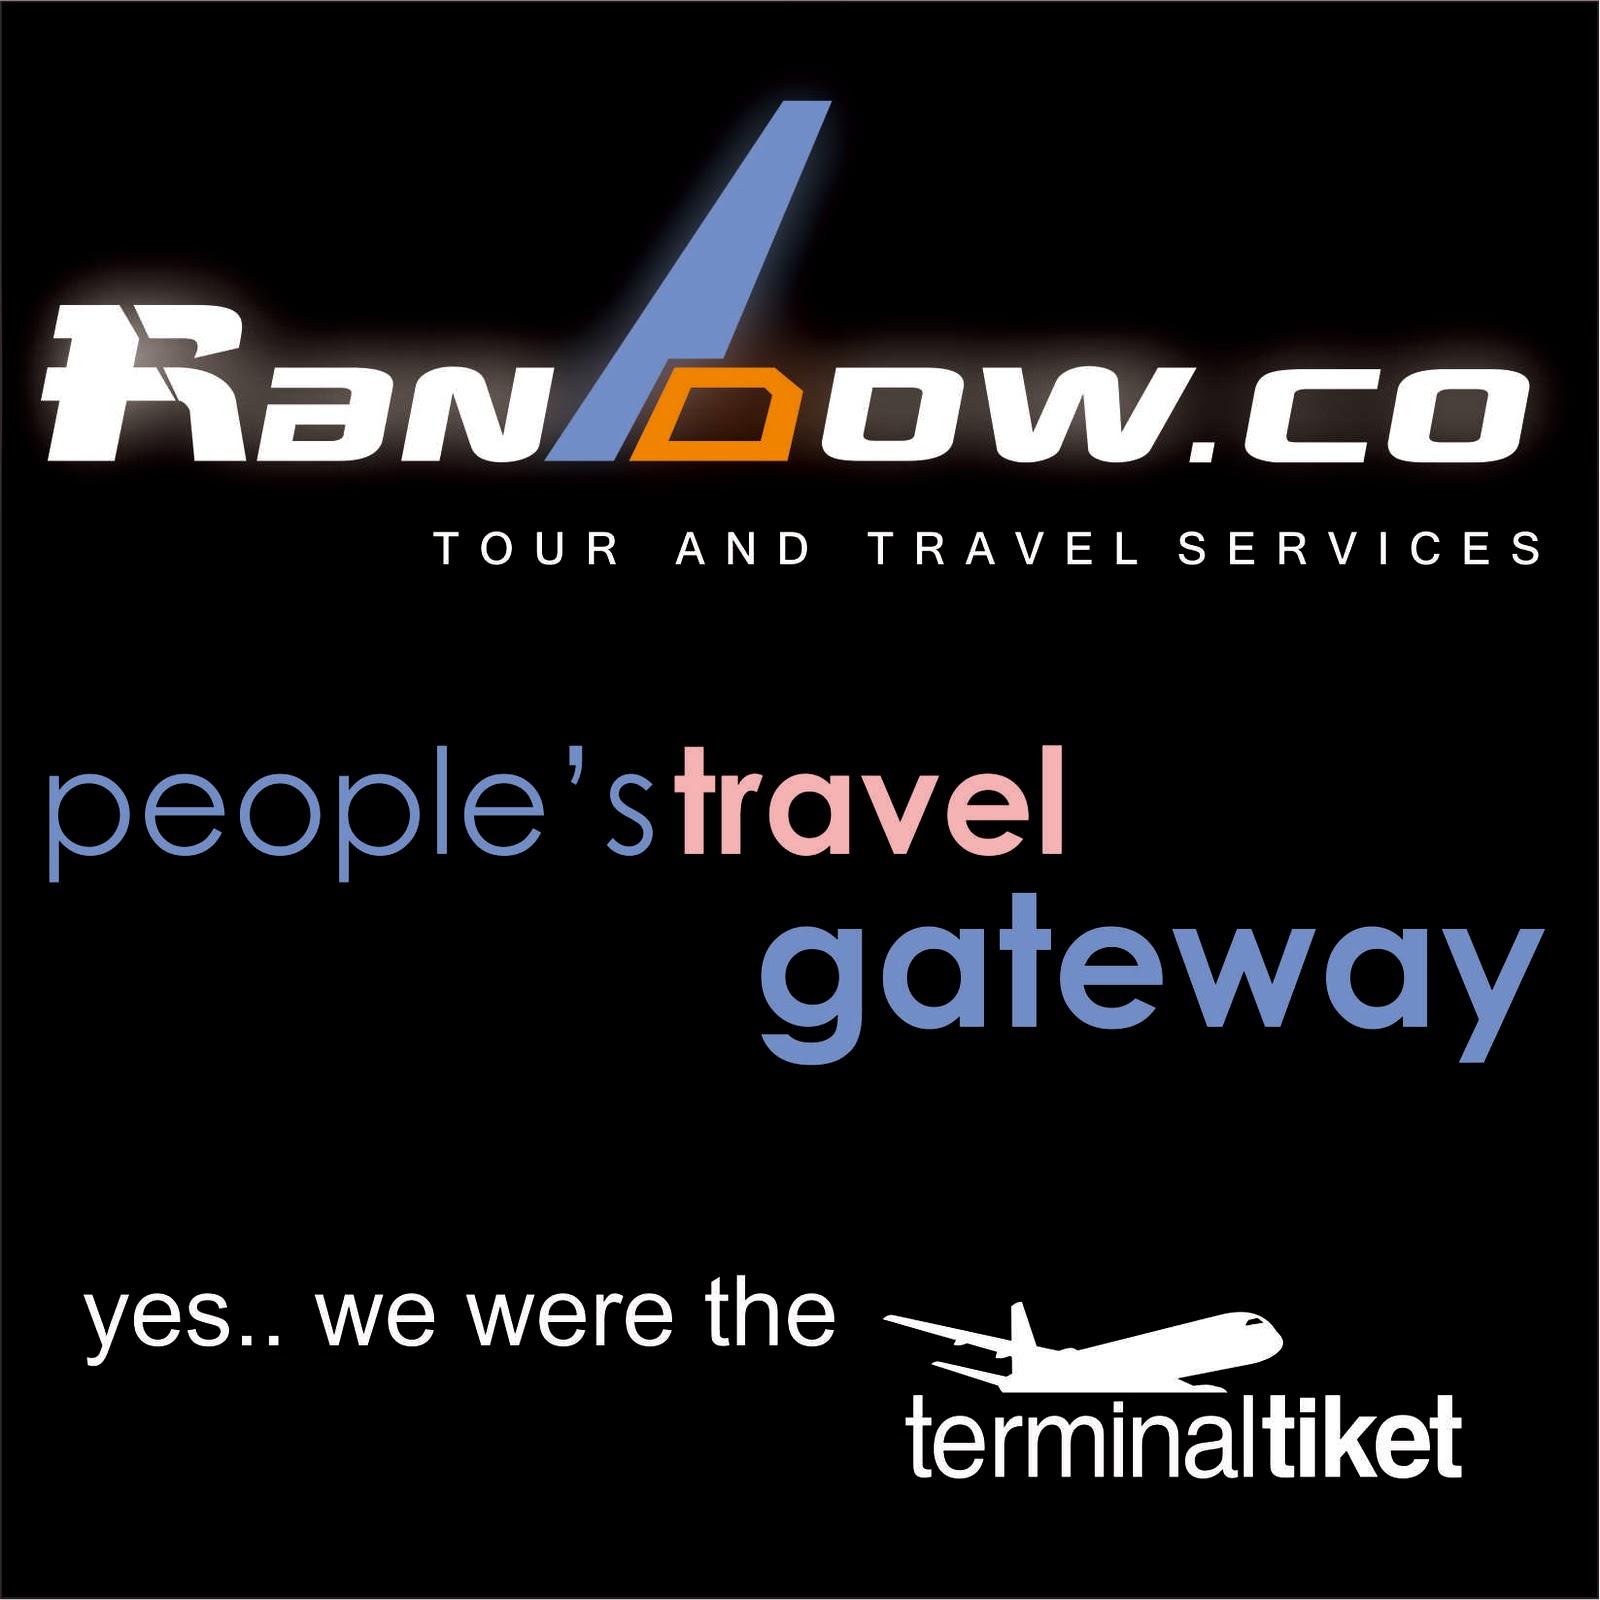 Kafila Travel 021 87780234 Jadwal Penerbangan Dan Harga Tiket Pesawat Domestik Dan Internasional